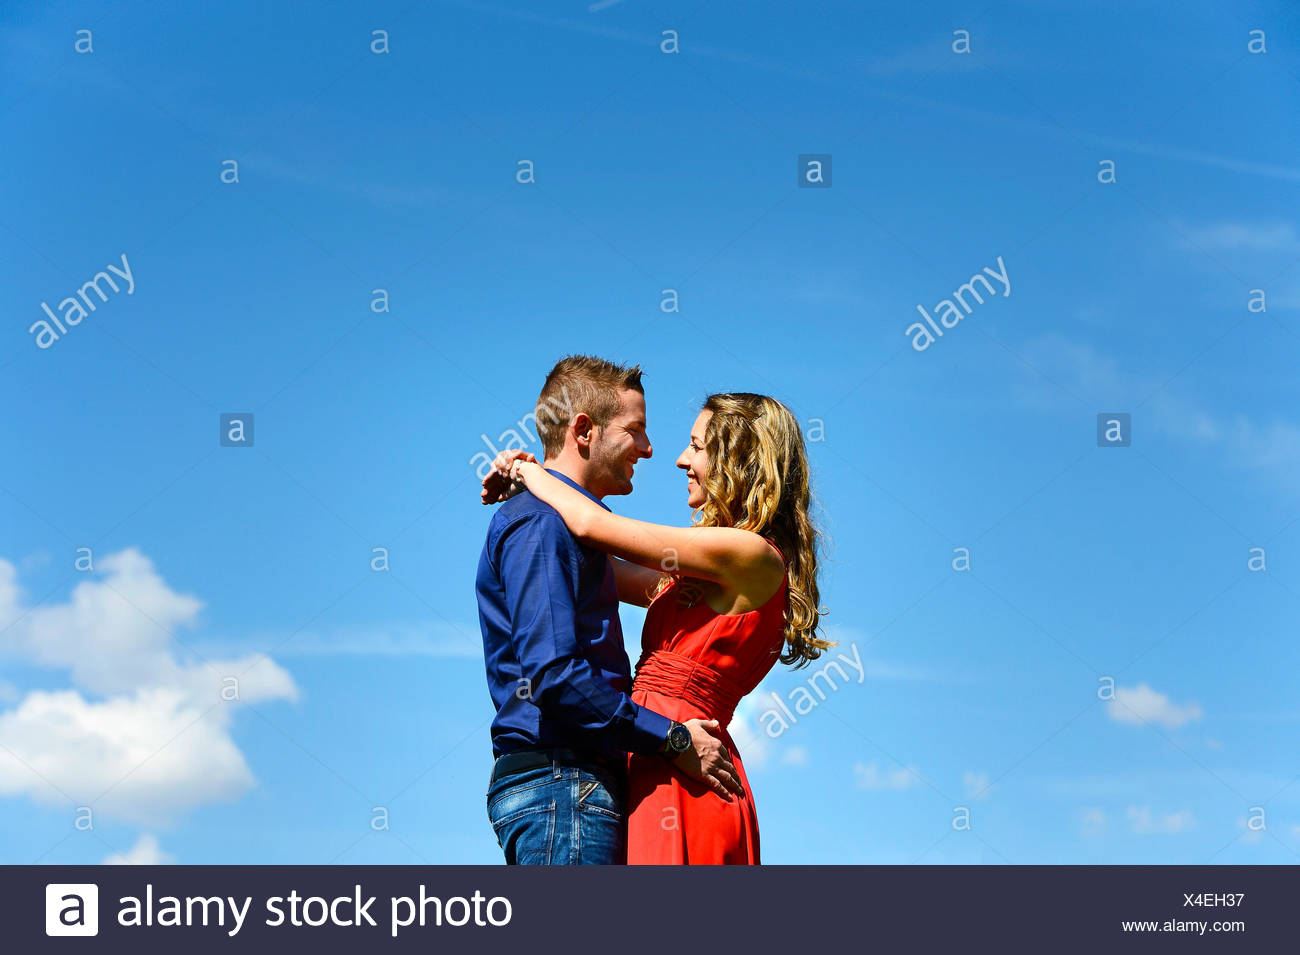 Lovers against a blue sky, Austria - Stock Image